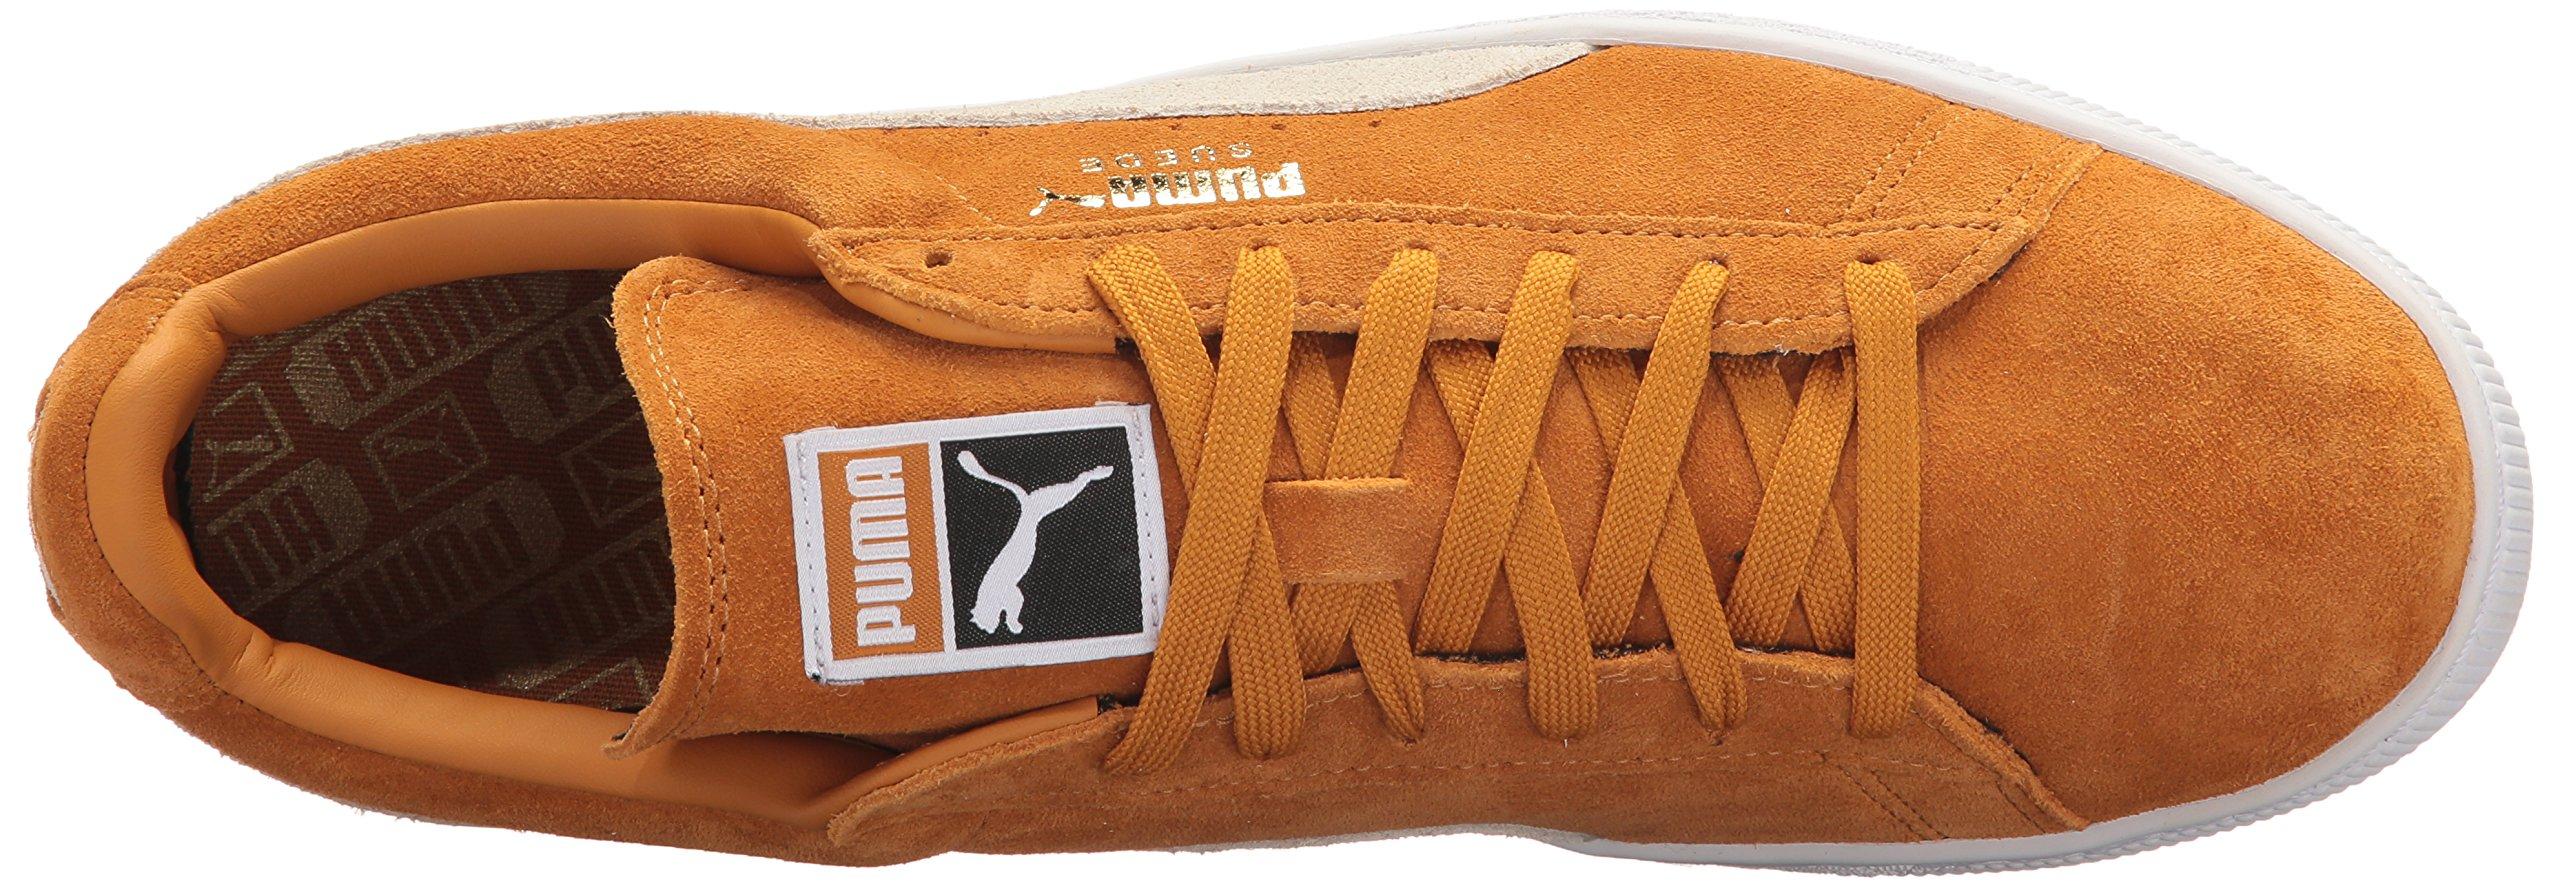 quality design 0f9aa 3bc77 PUMA Men's Suede Classic Fashion Sneaker, Inca Gold-puma ...